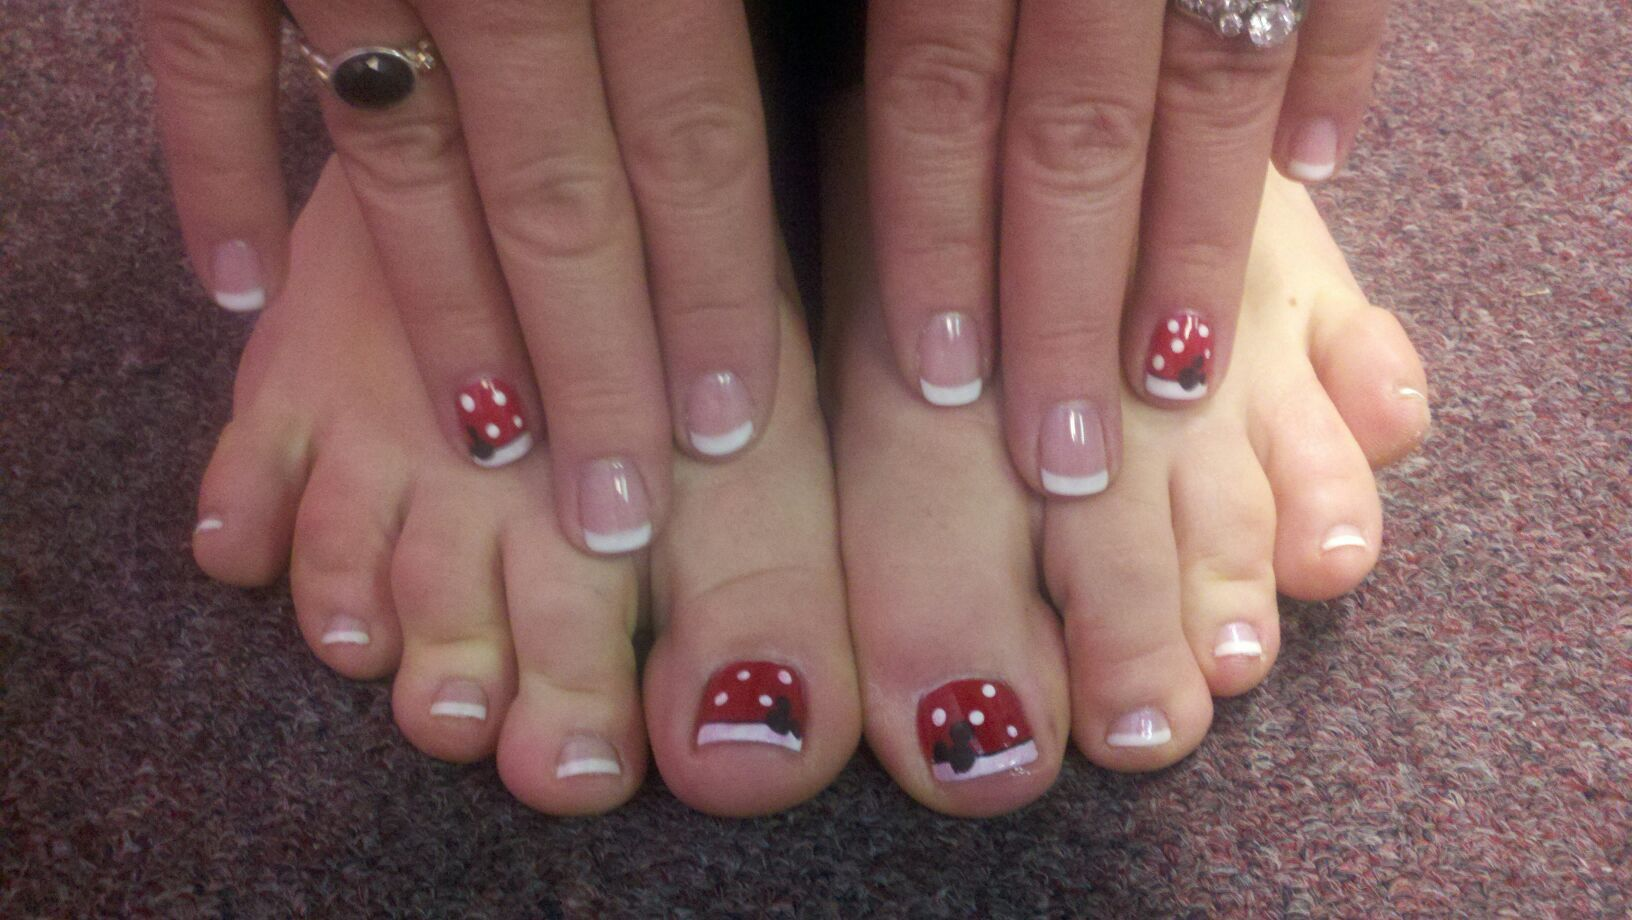 Disney Nail Art Shellac Manicure The Nail Station Glen Burnie Md Disney Nails Mickey Nails Disney Toe Nails